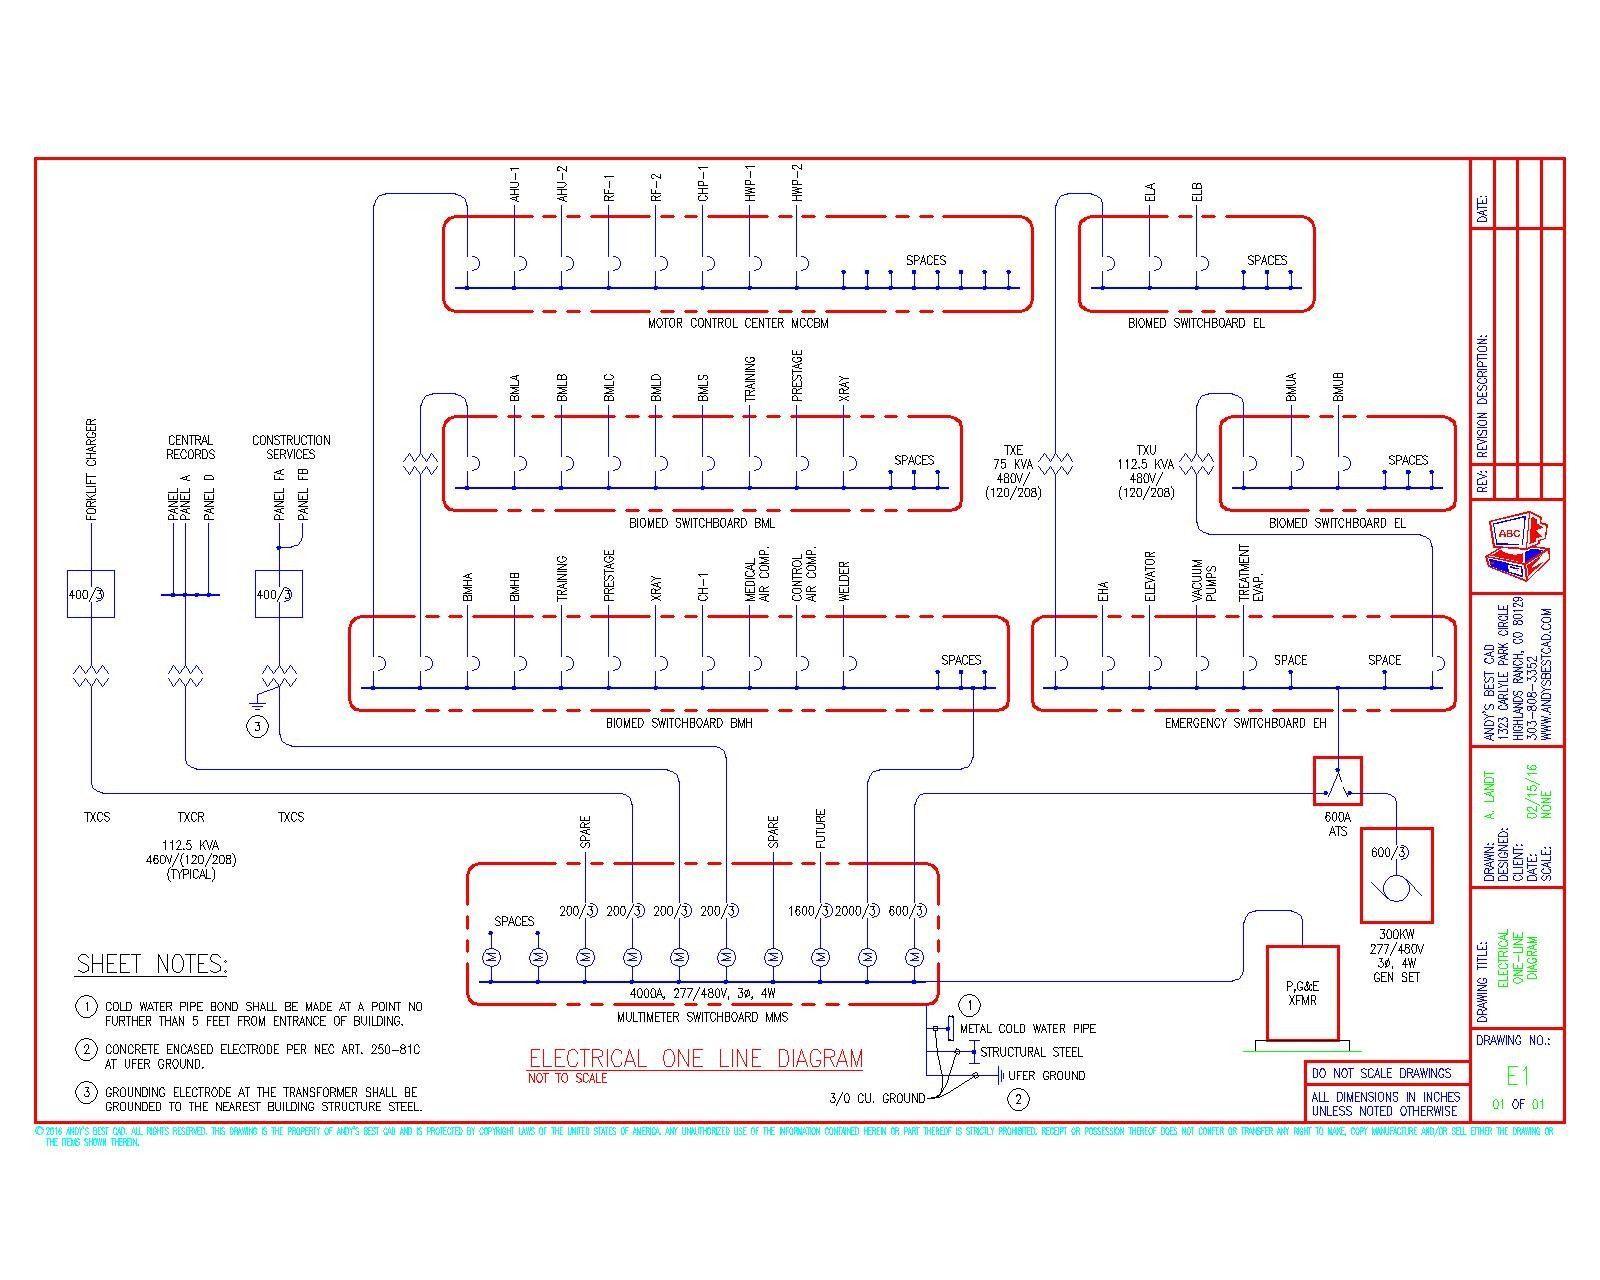 Ahu Wiring Diagram Pdf